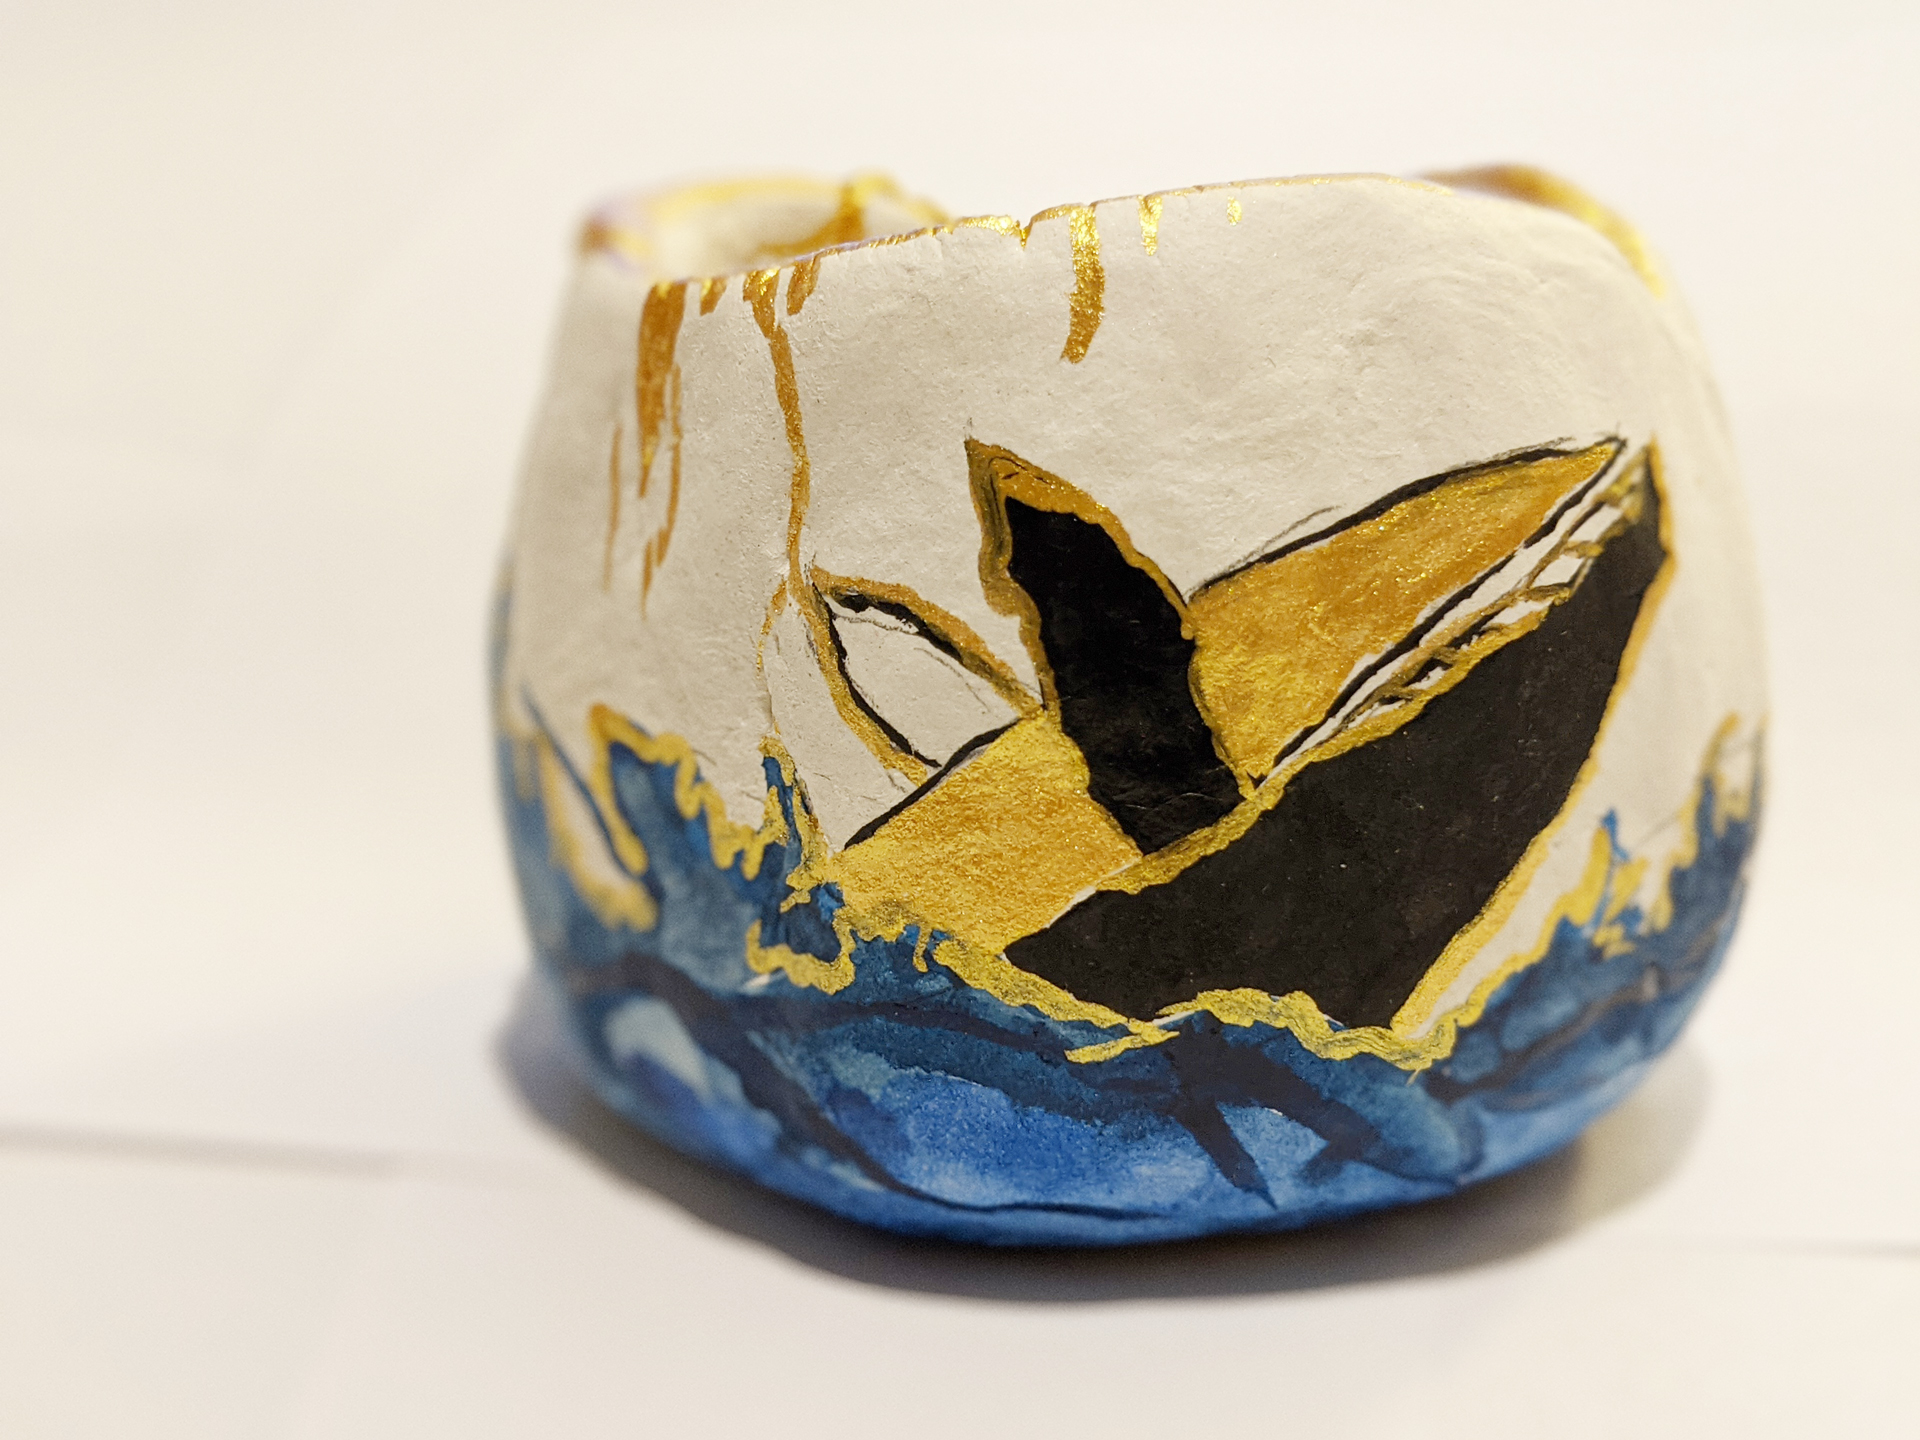 Whale Pinch Pot by Fan Stanbrough